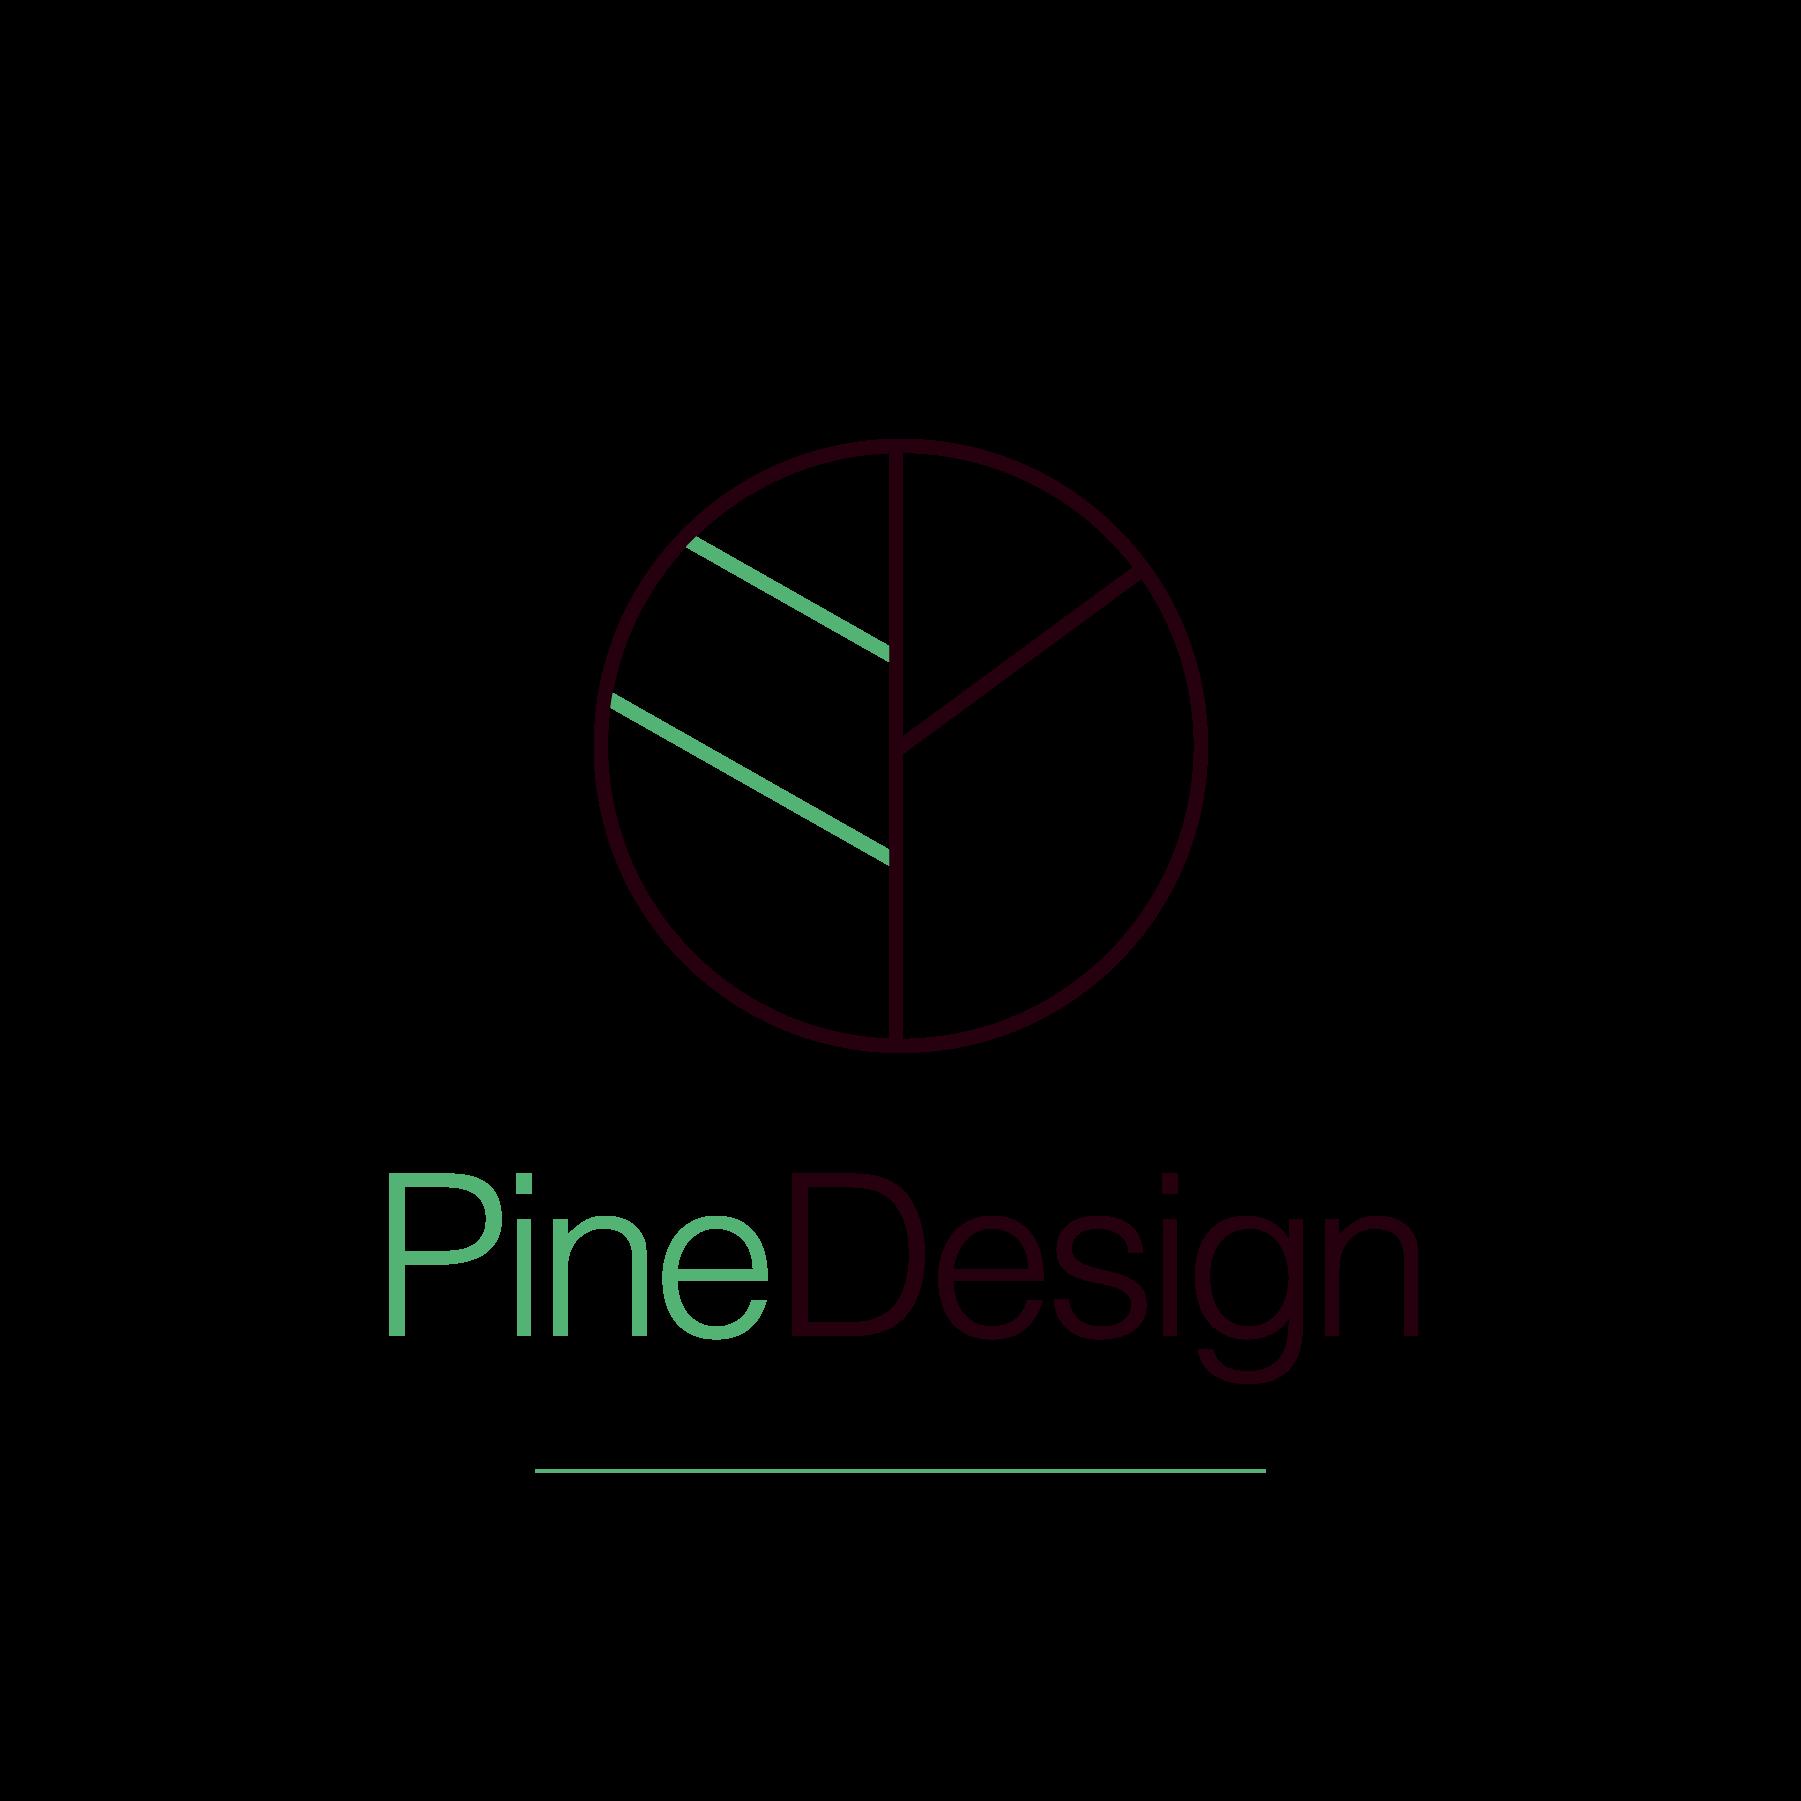 Pine Design Primary Logo